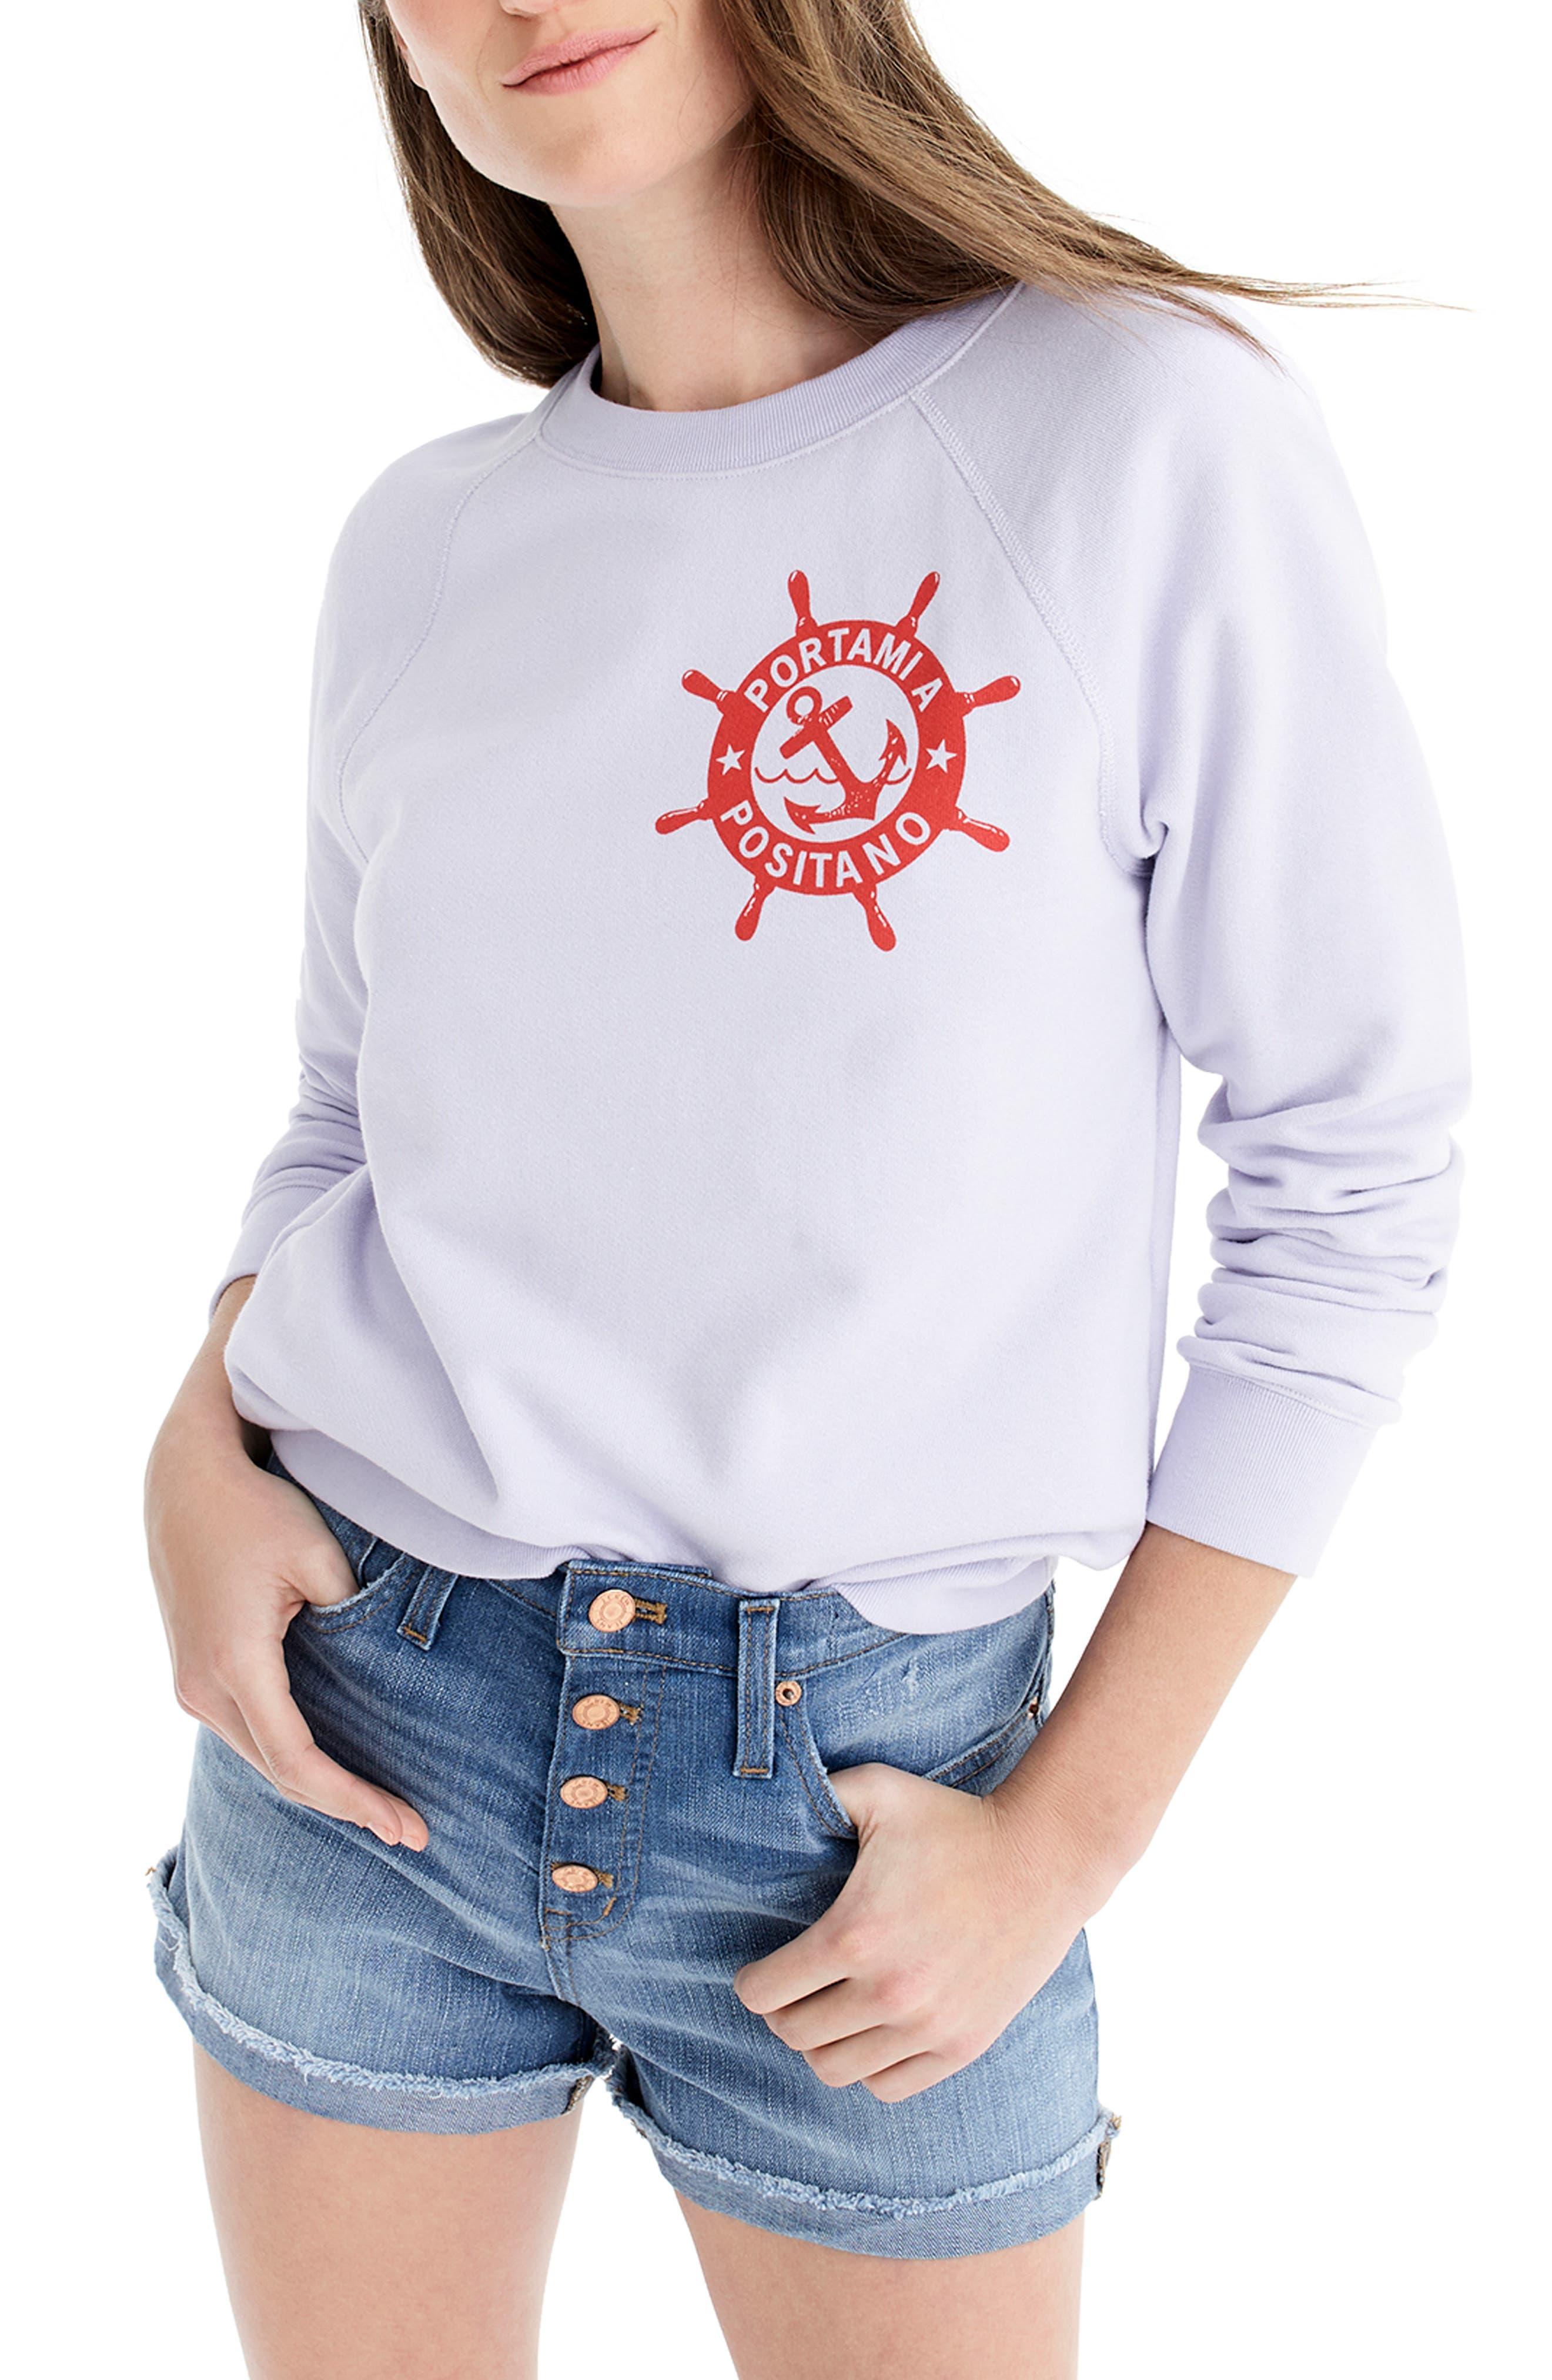 Portami a Positano Raglan Sweatshirt, Main, color, SWEET HYACINTH